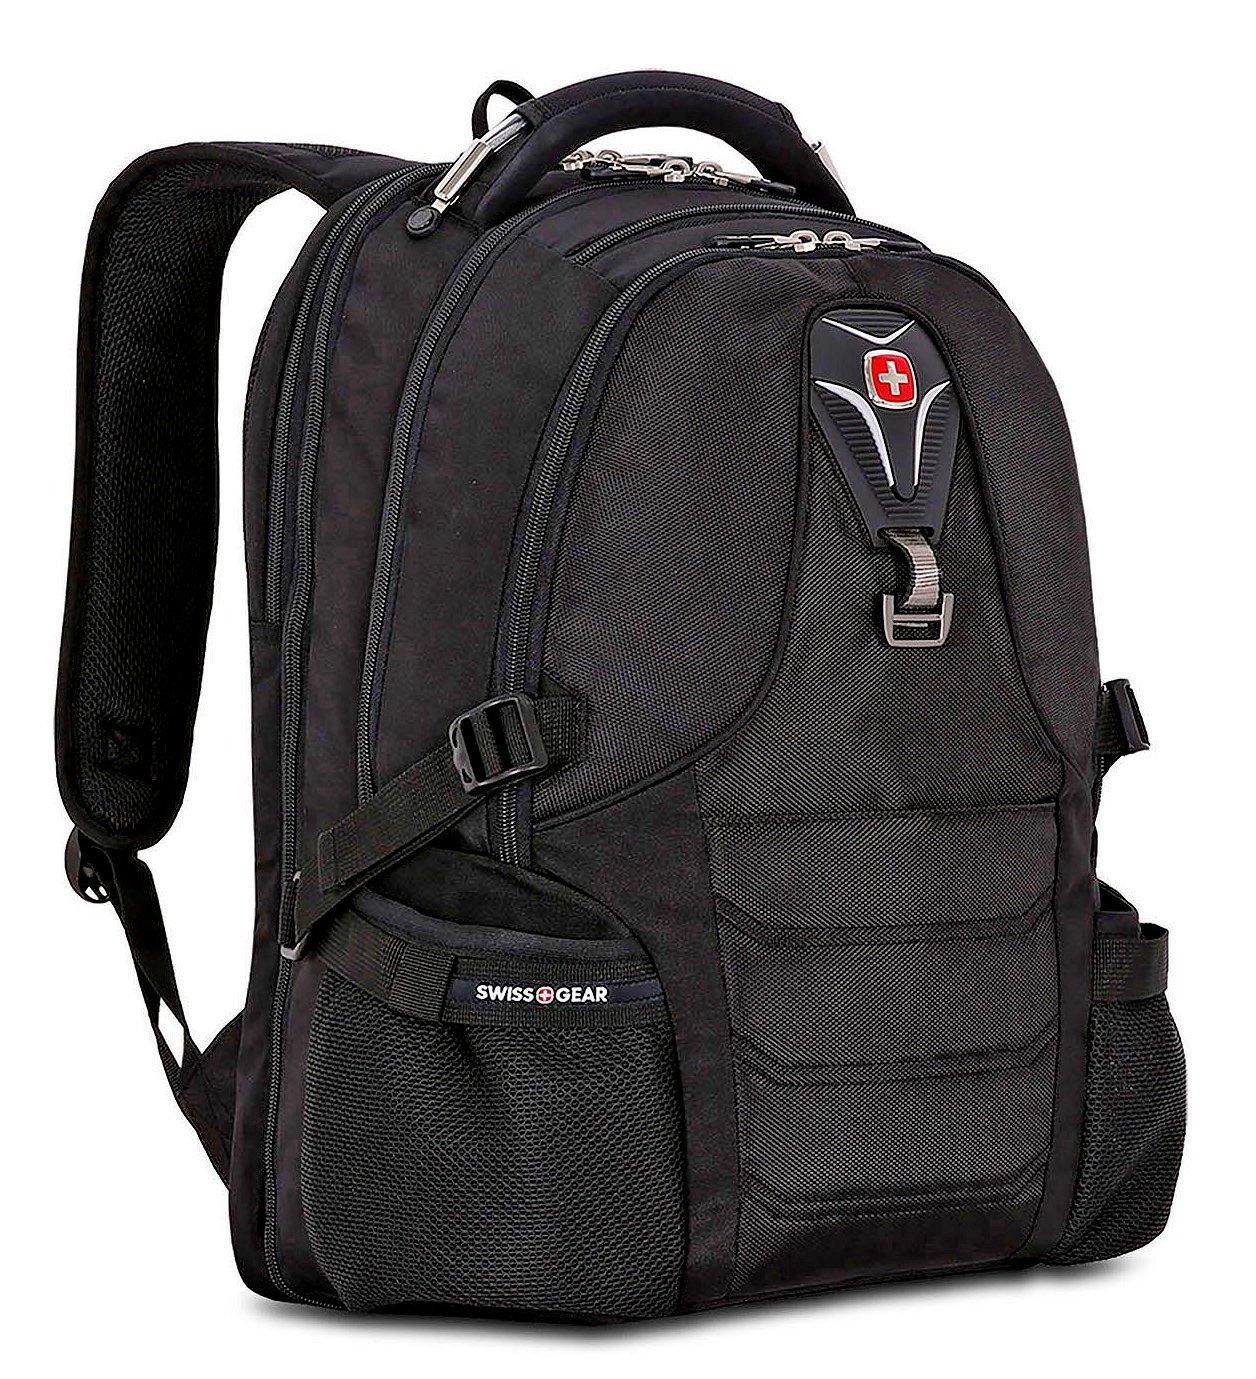 SwissGear Premium Laptop Notebook ScanSmart Backpack, Swiss Gear Outdoor Travel School Bag